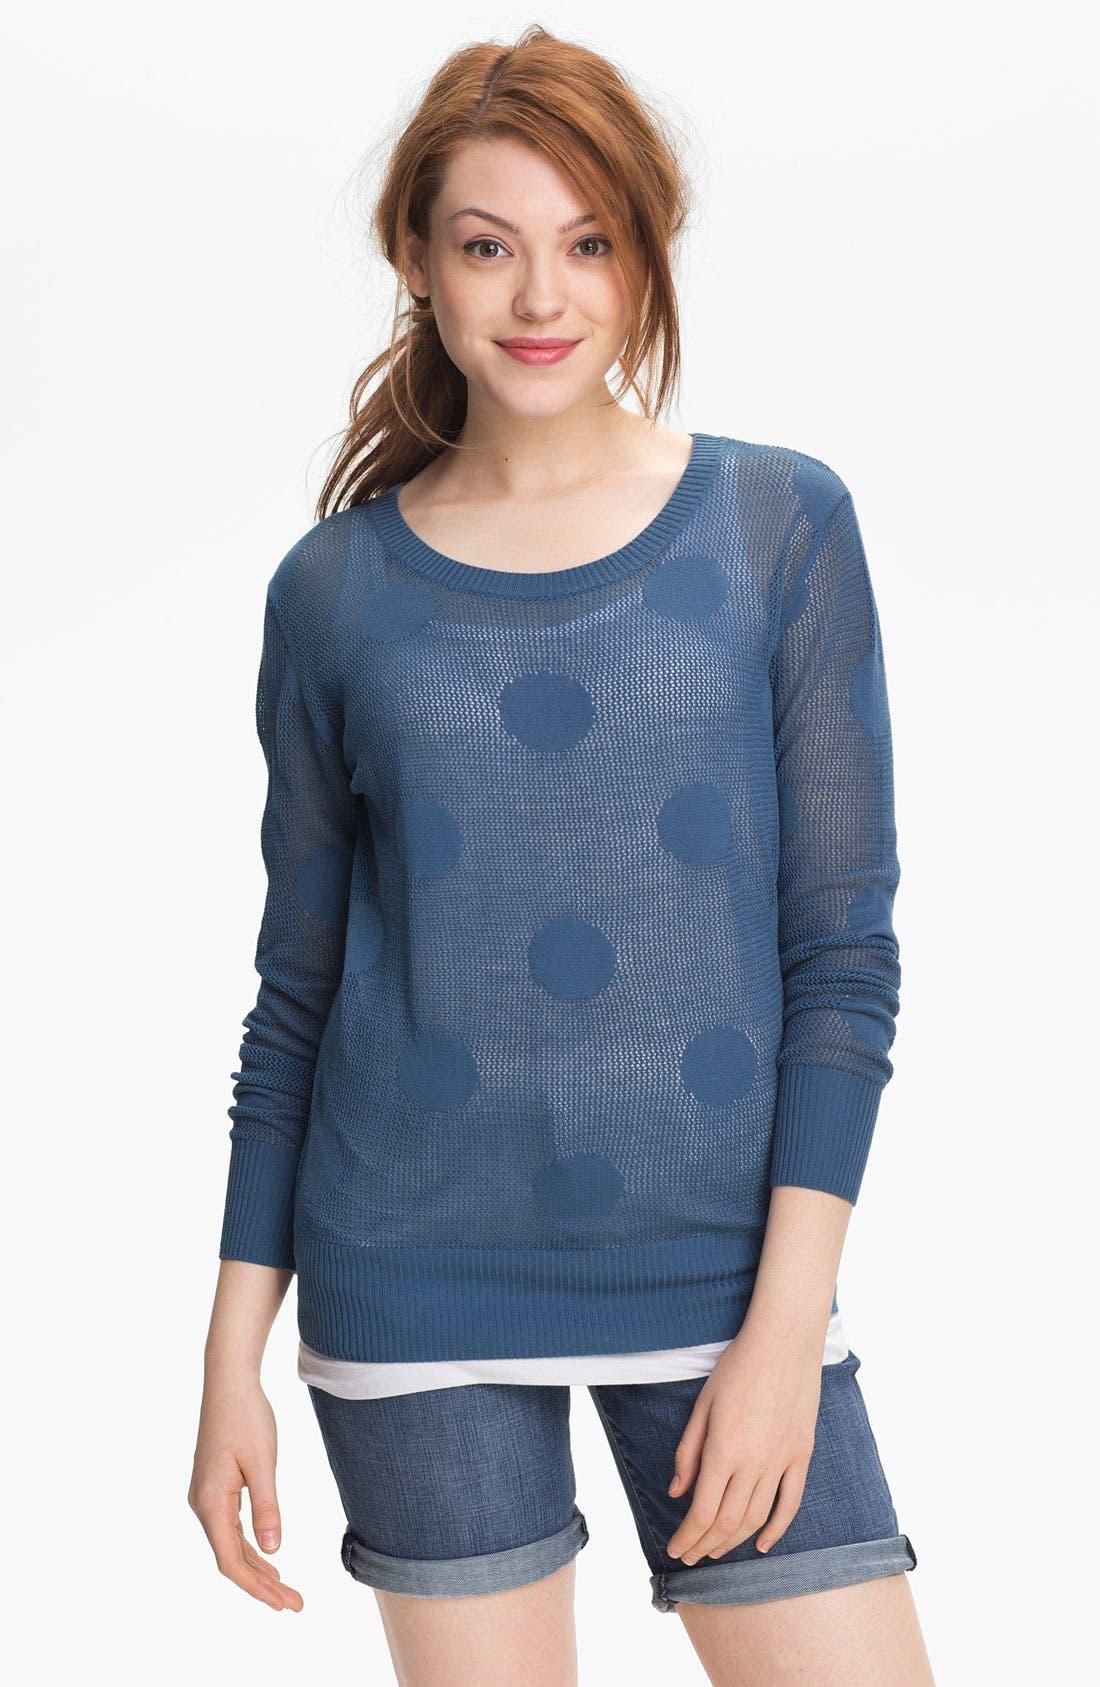 Main Image - Max & Mia Polka Dot Sweater